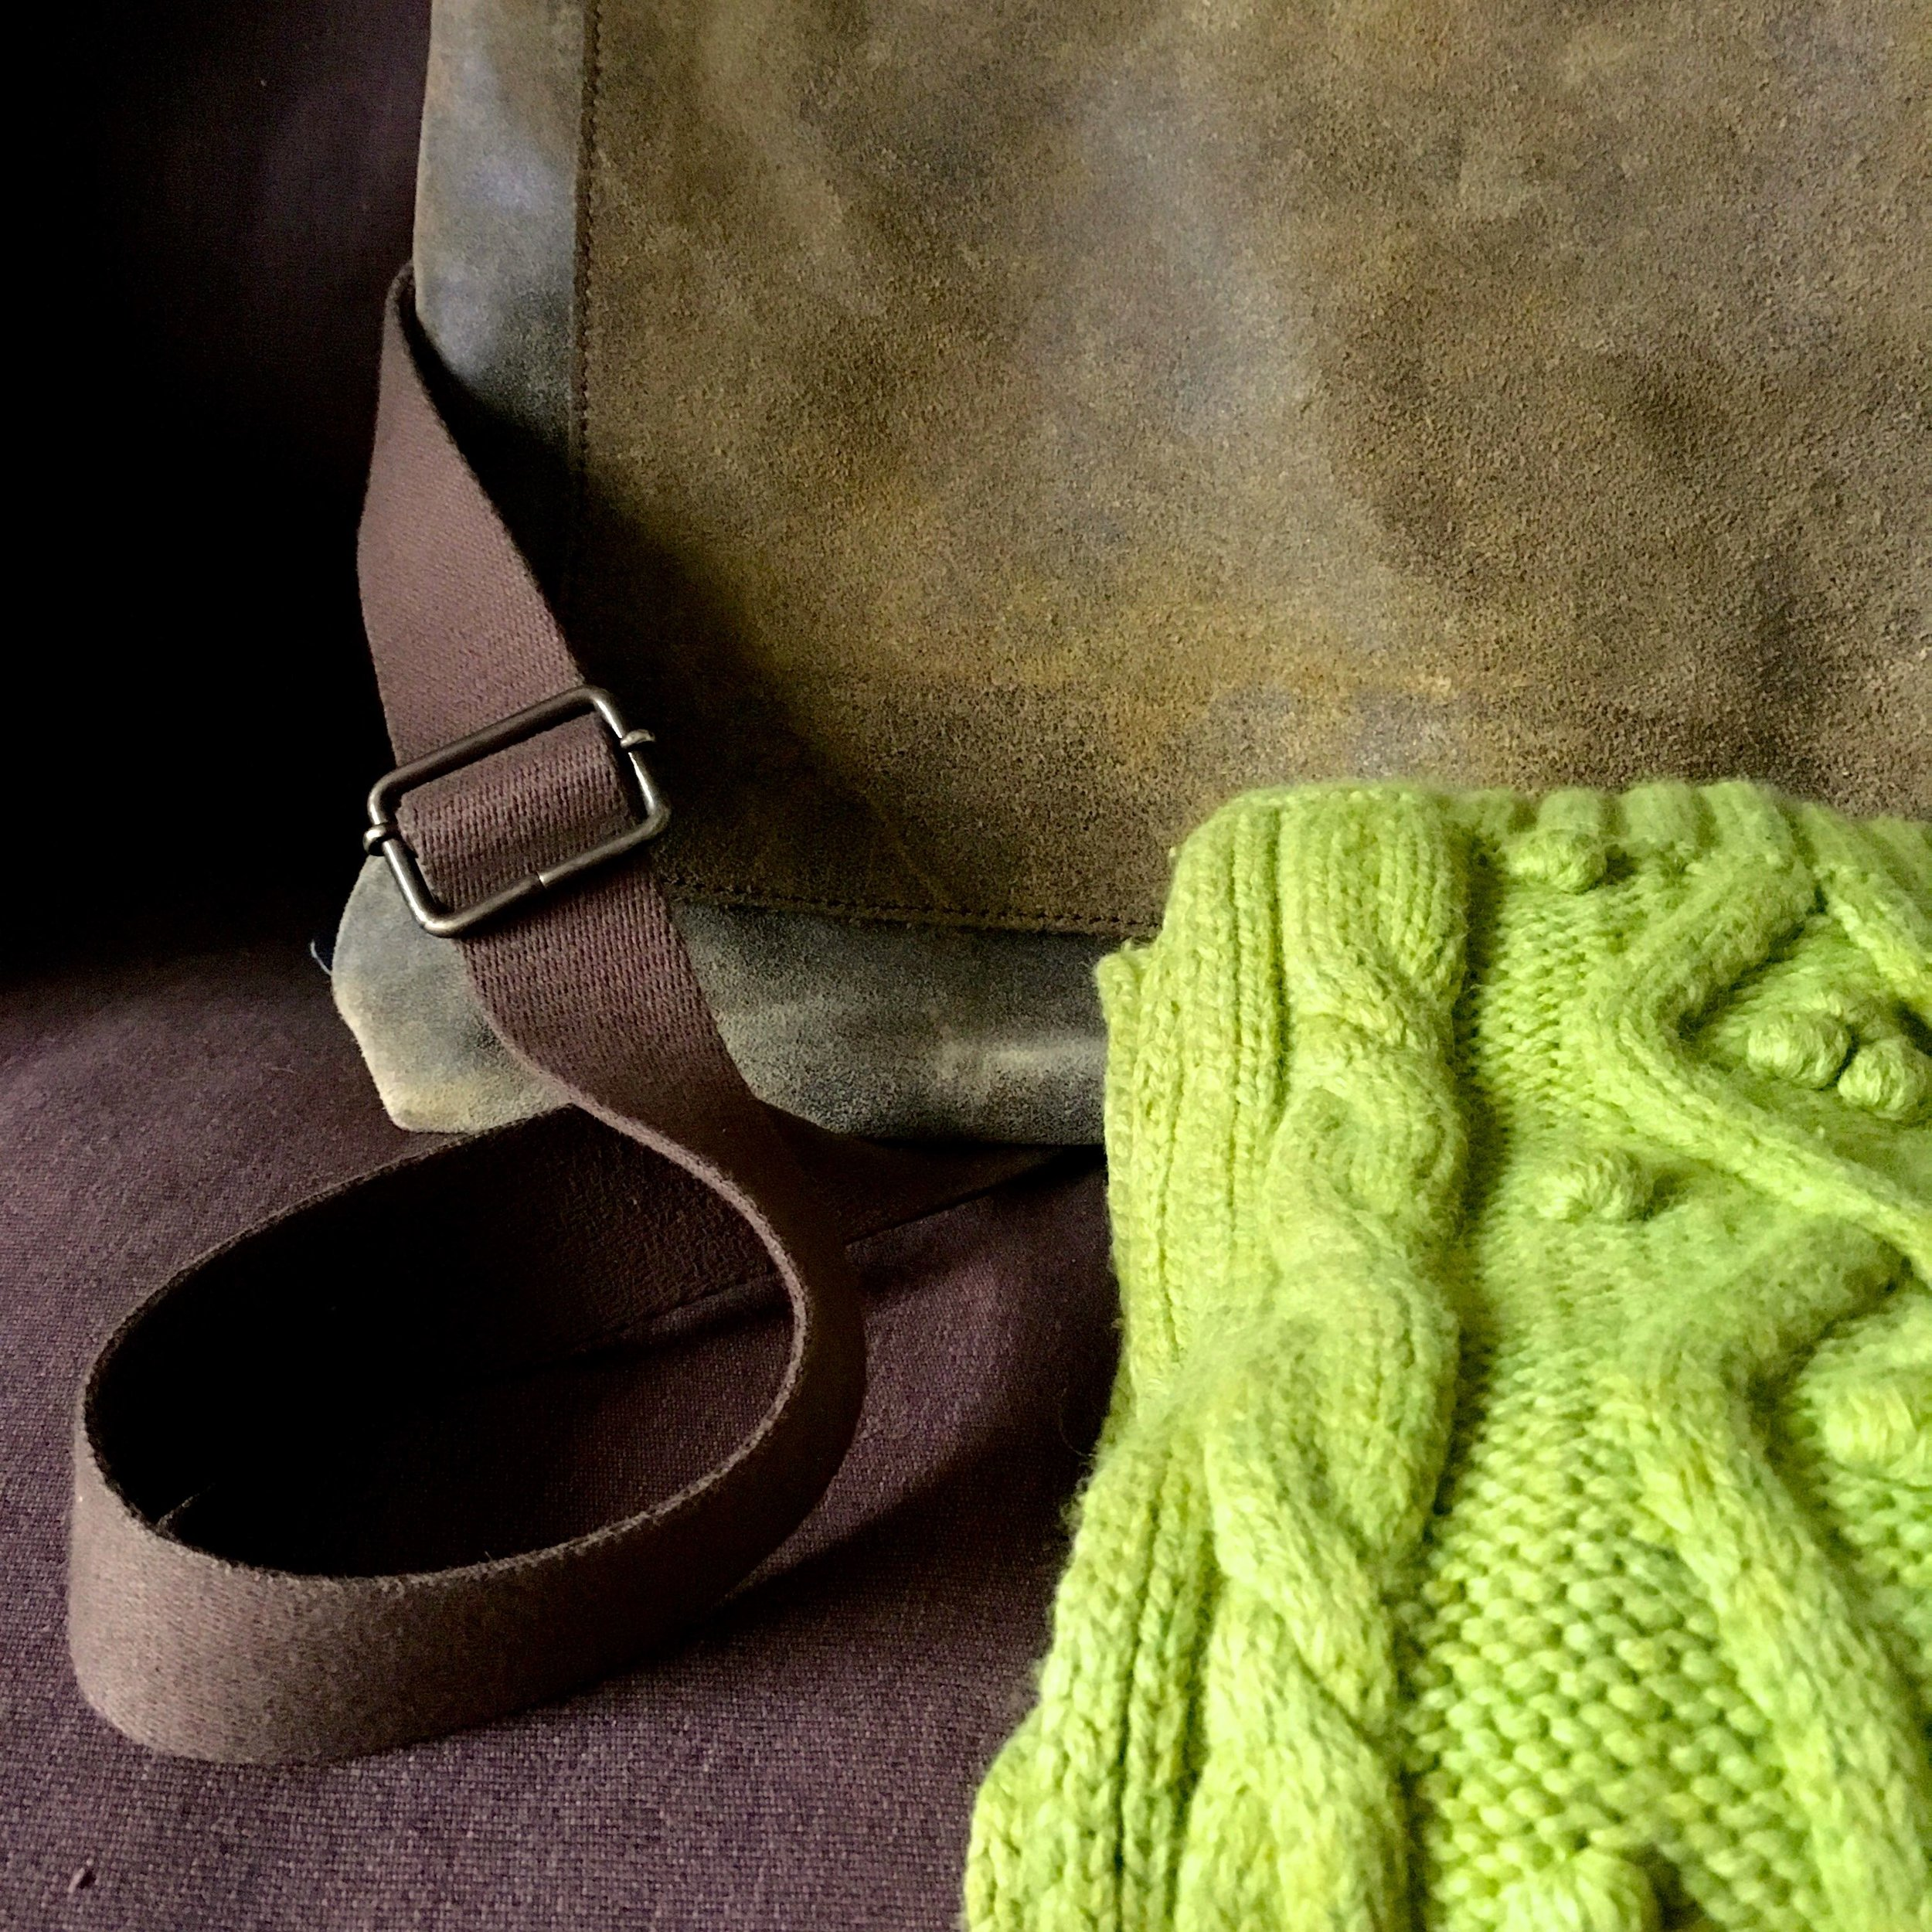 My vintage Boden scarf and satchel bag